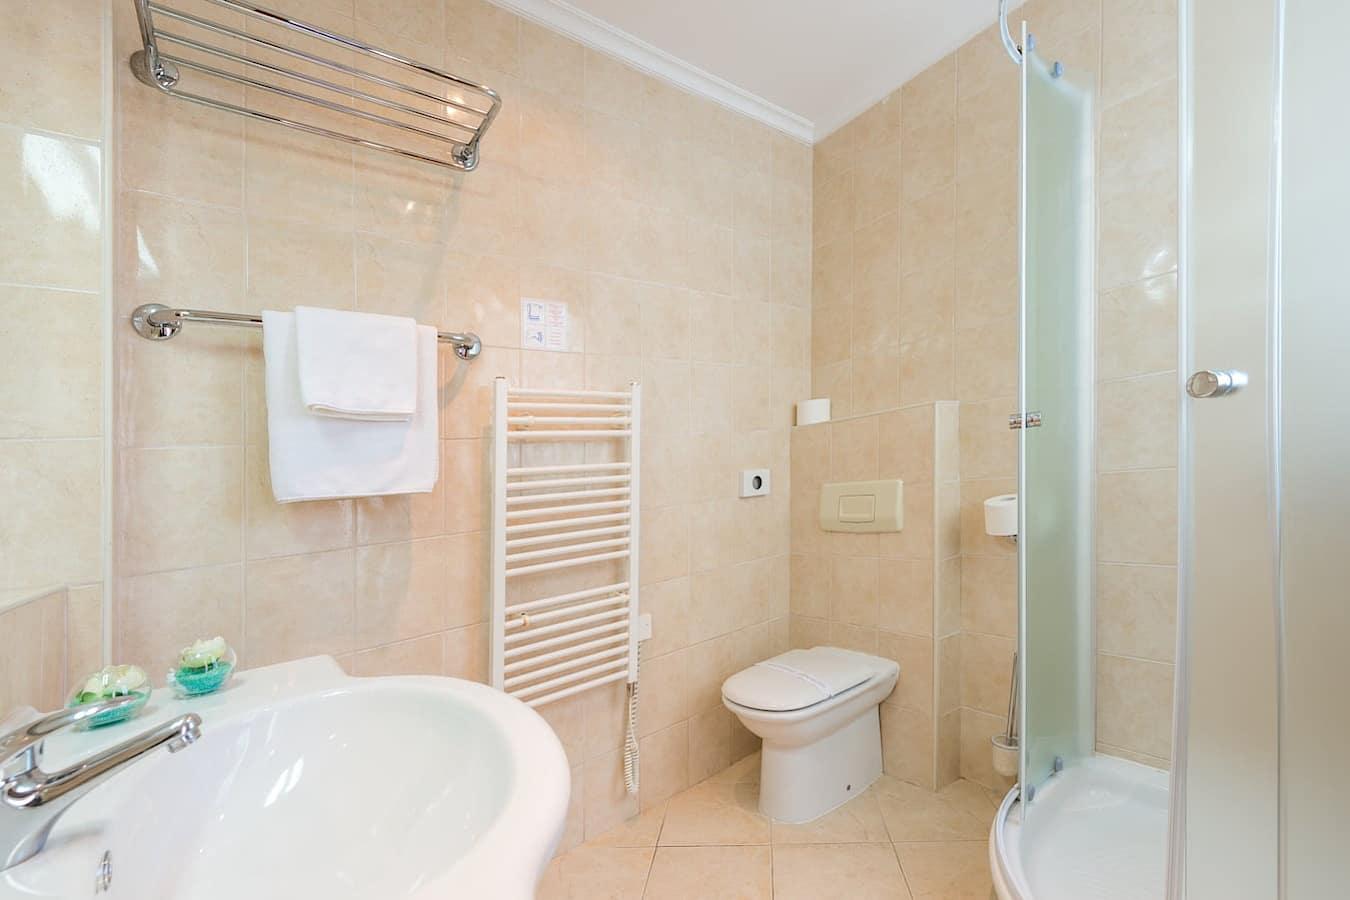 hotel-vis-dubrovnik-double-twin-single-bathroom-shower.jpg